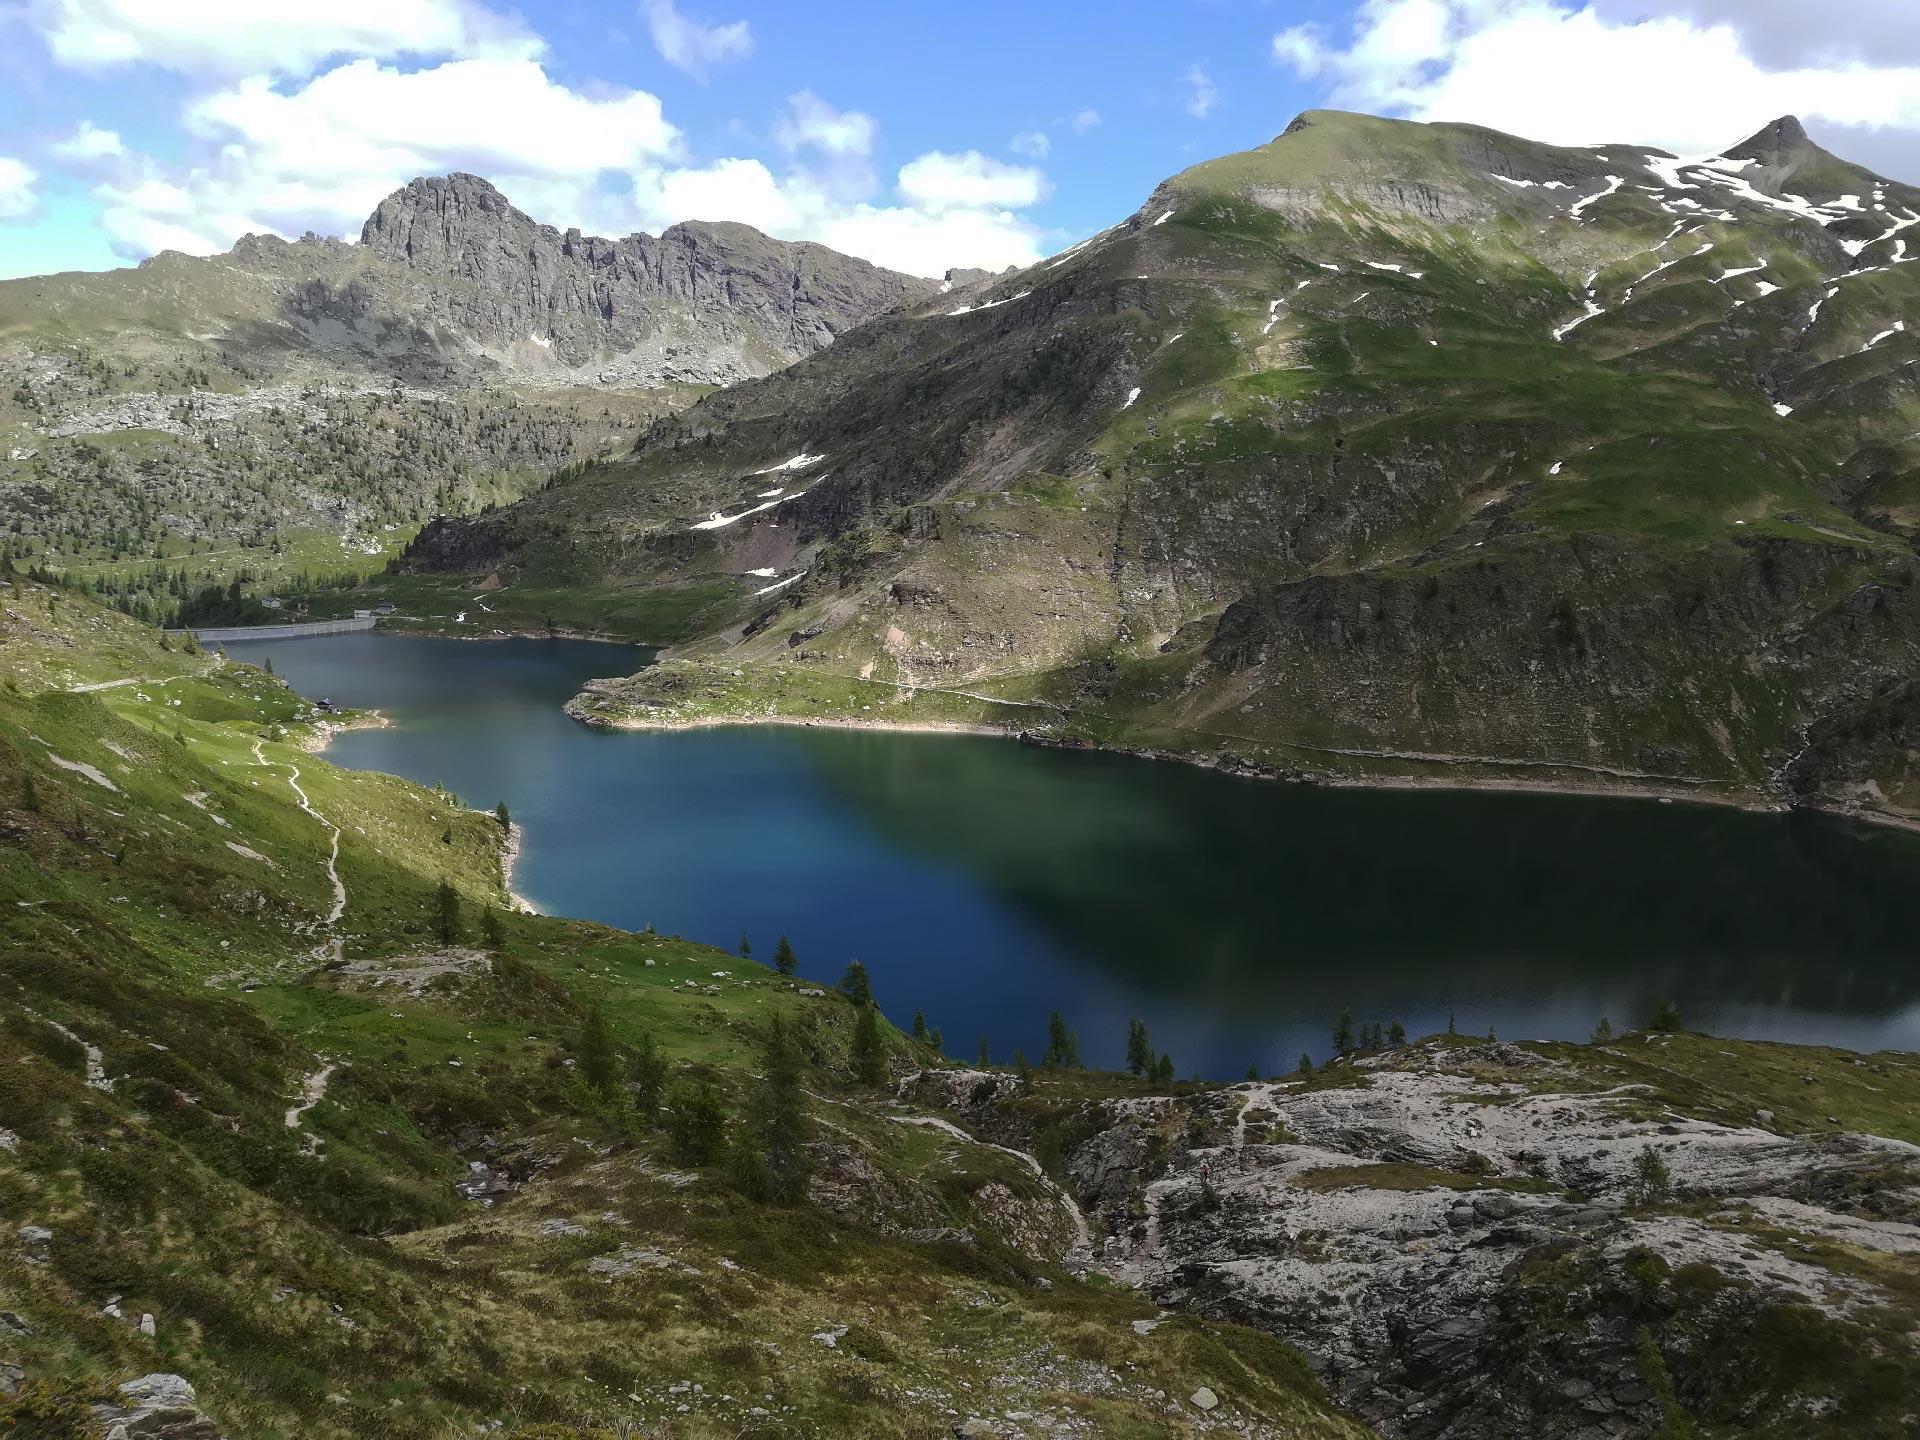 veduta dei Laghi Gemelli, Val Brembana, Lombardia